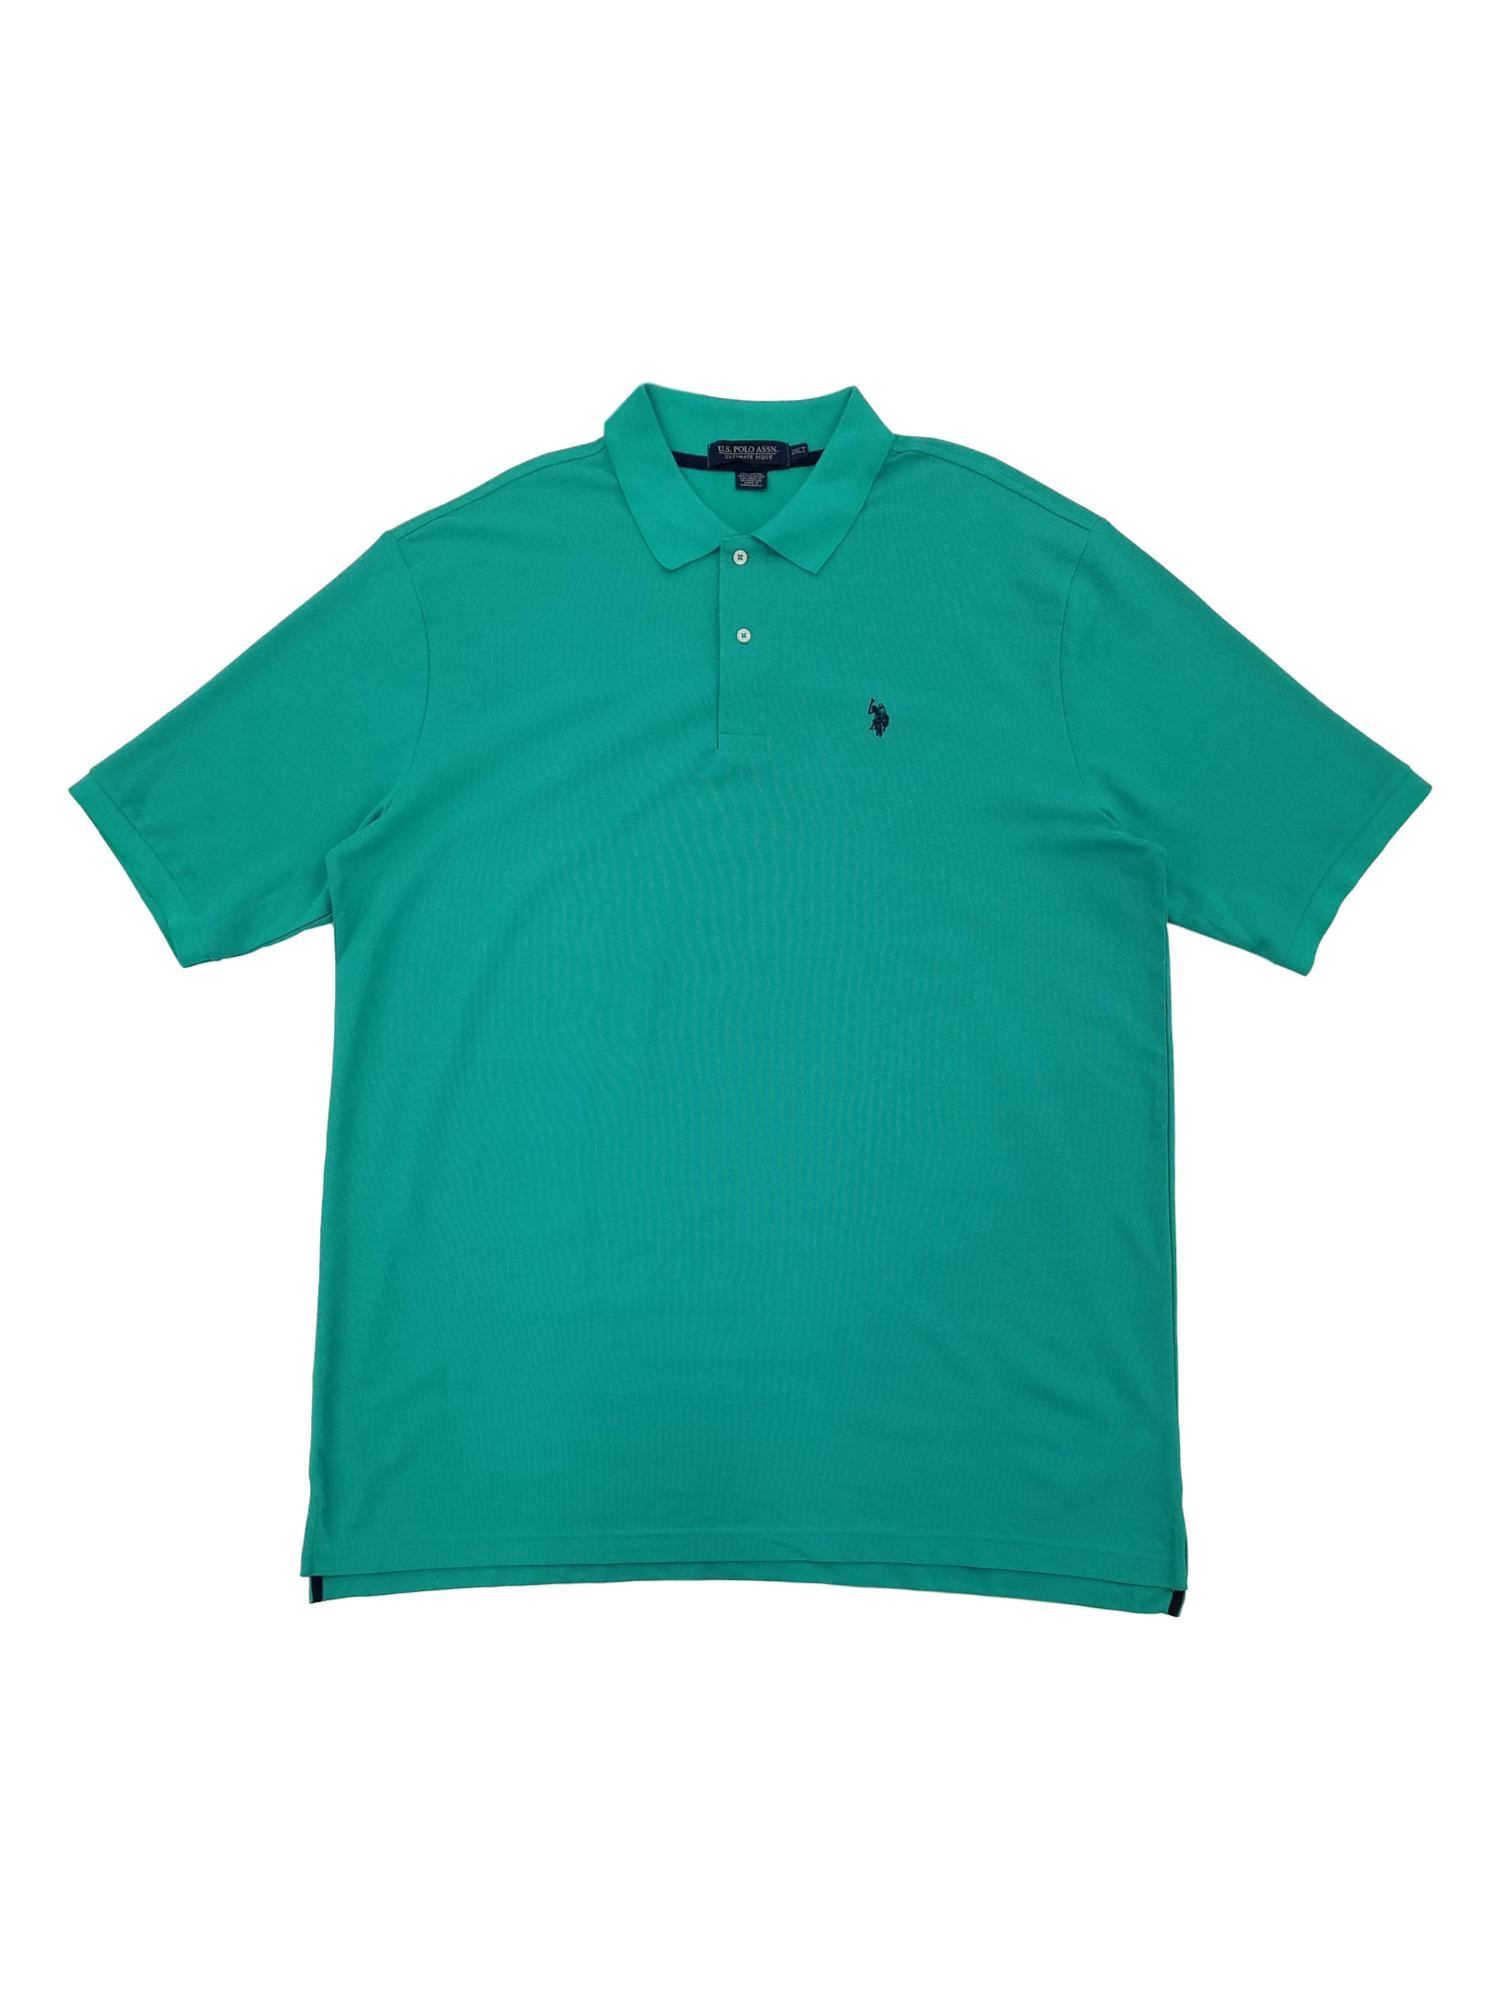 U.S. Polo Assn. Mens Big & Tall Green Performance Golf Polo T-Shirt - Walmart.com